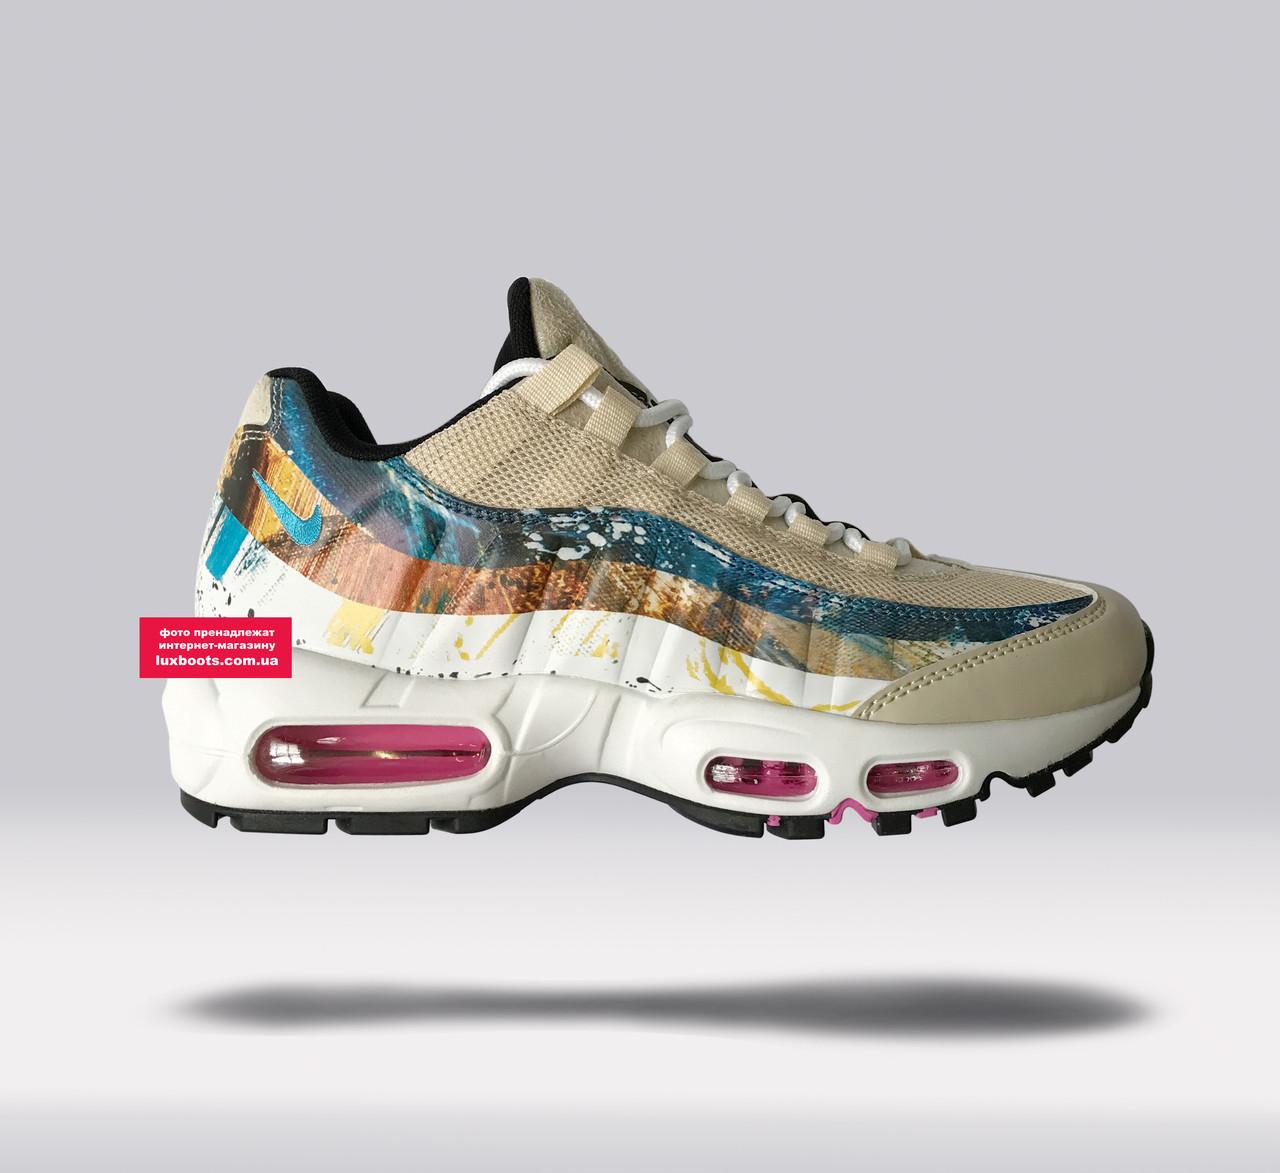 539d812677 Женские кроссовки Nike Air Max 95 x Dave White x size? Rabbit Stone/Thunder